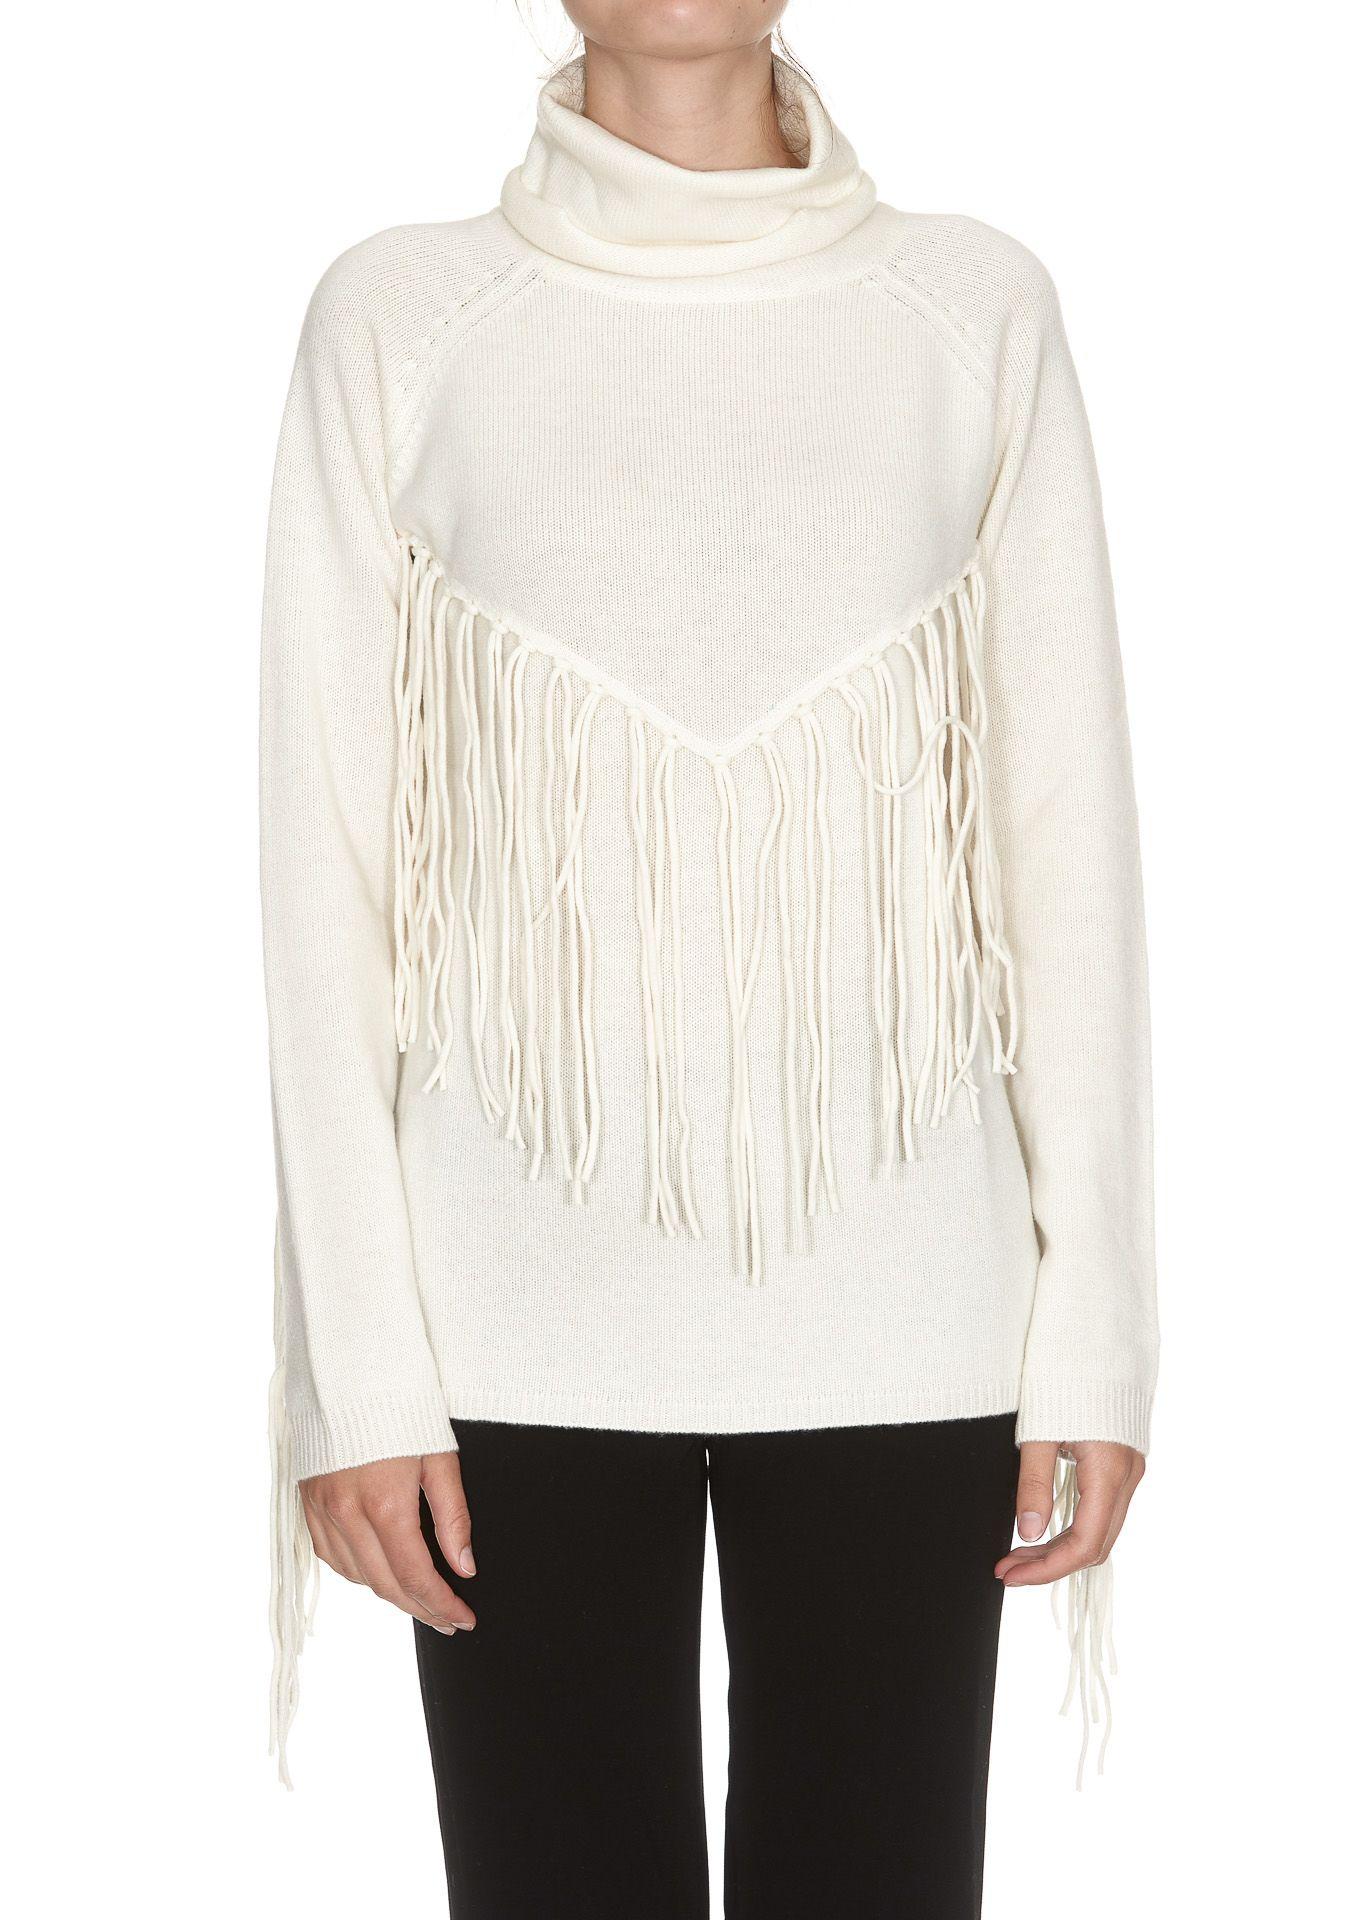 Parosh Lafringe Turtleneck Sweater